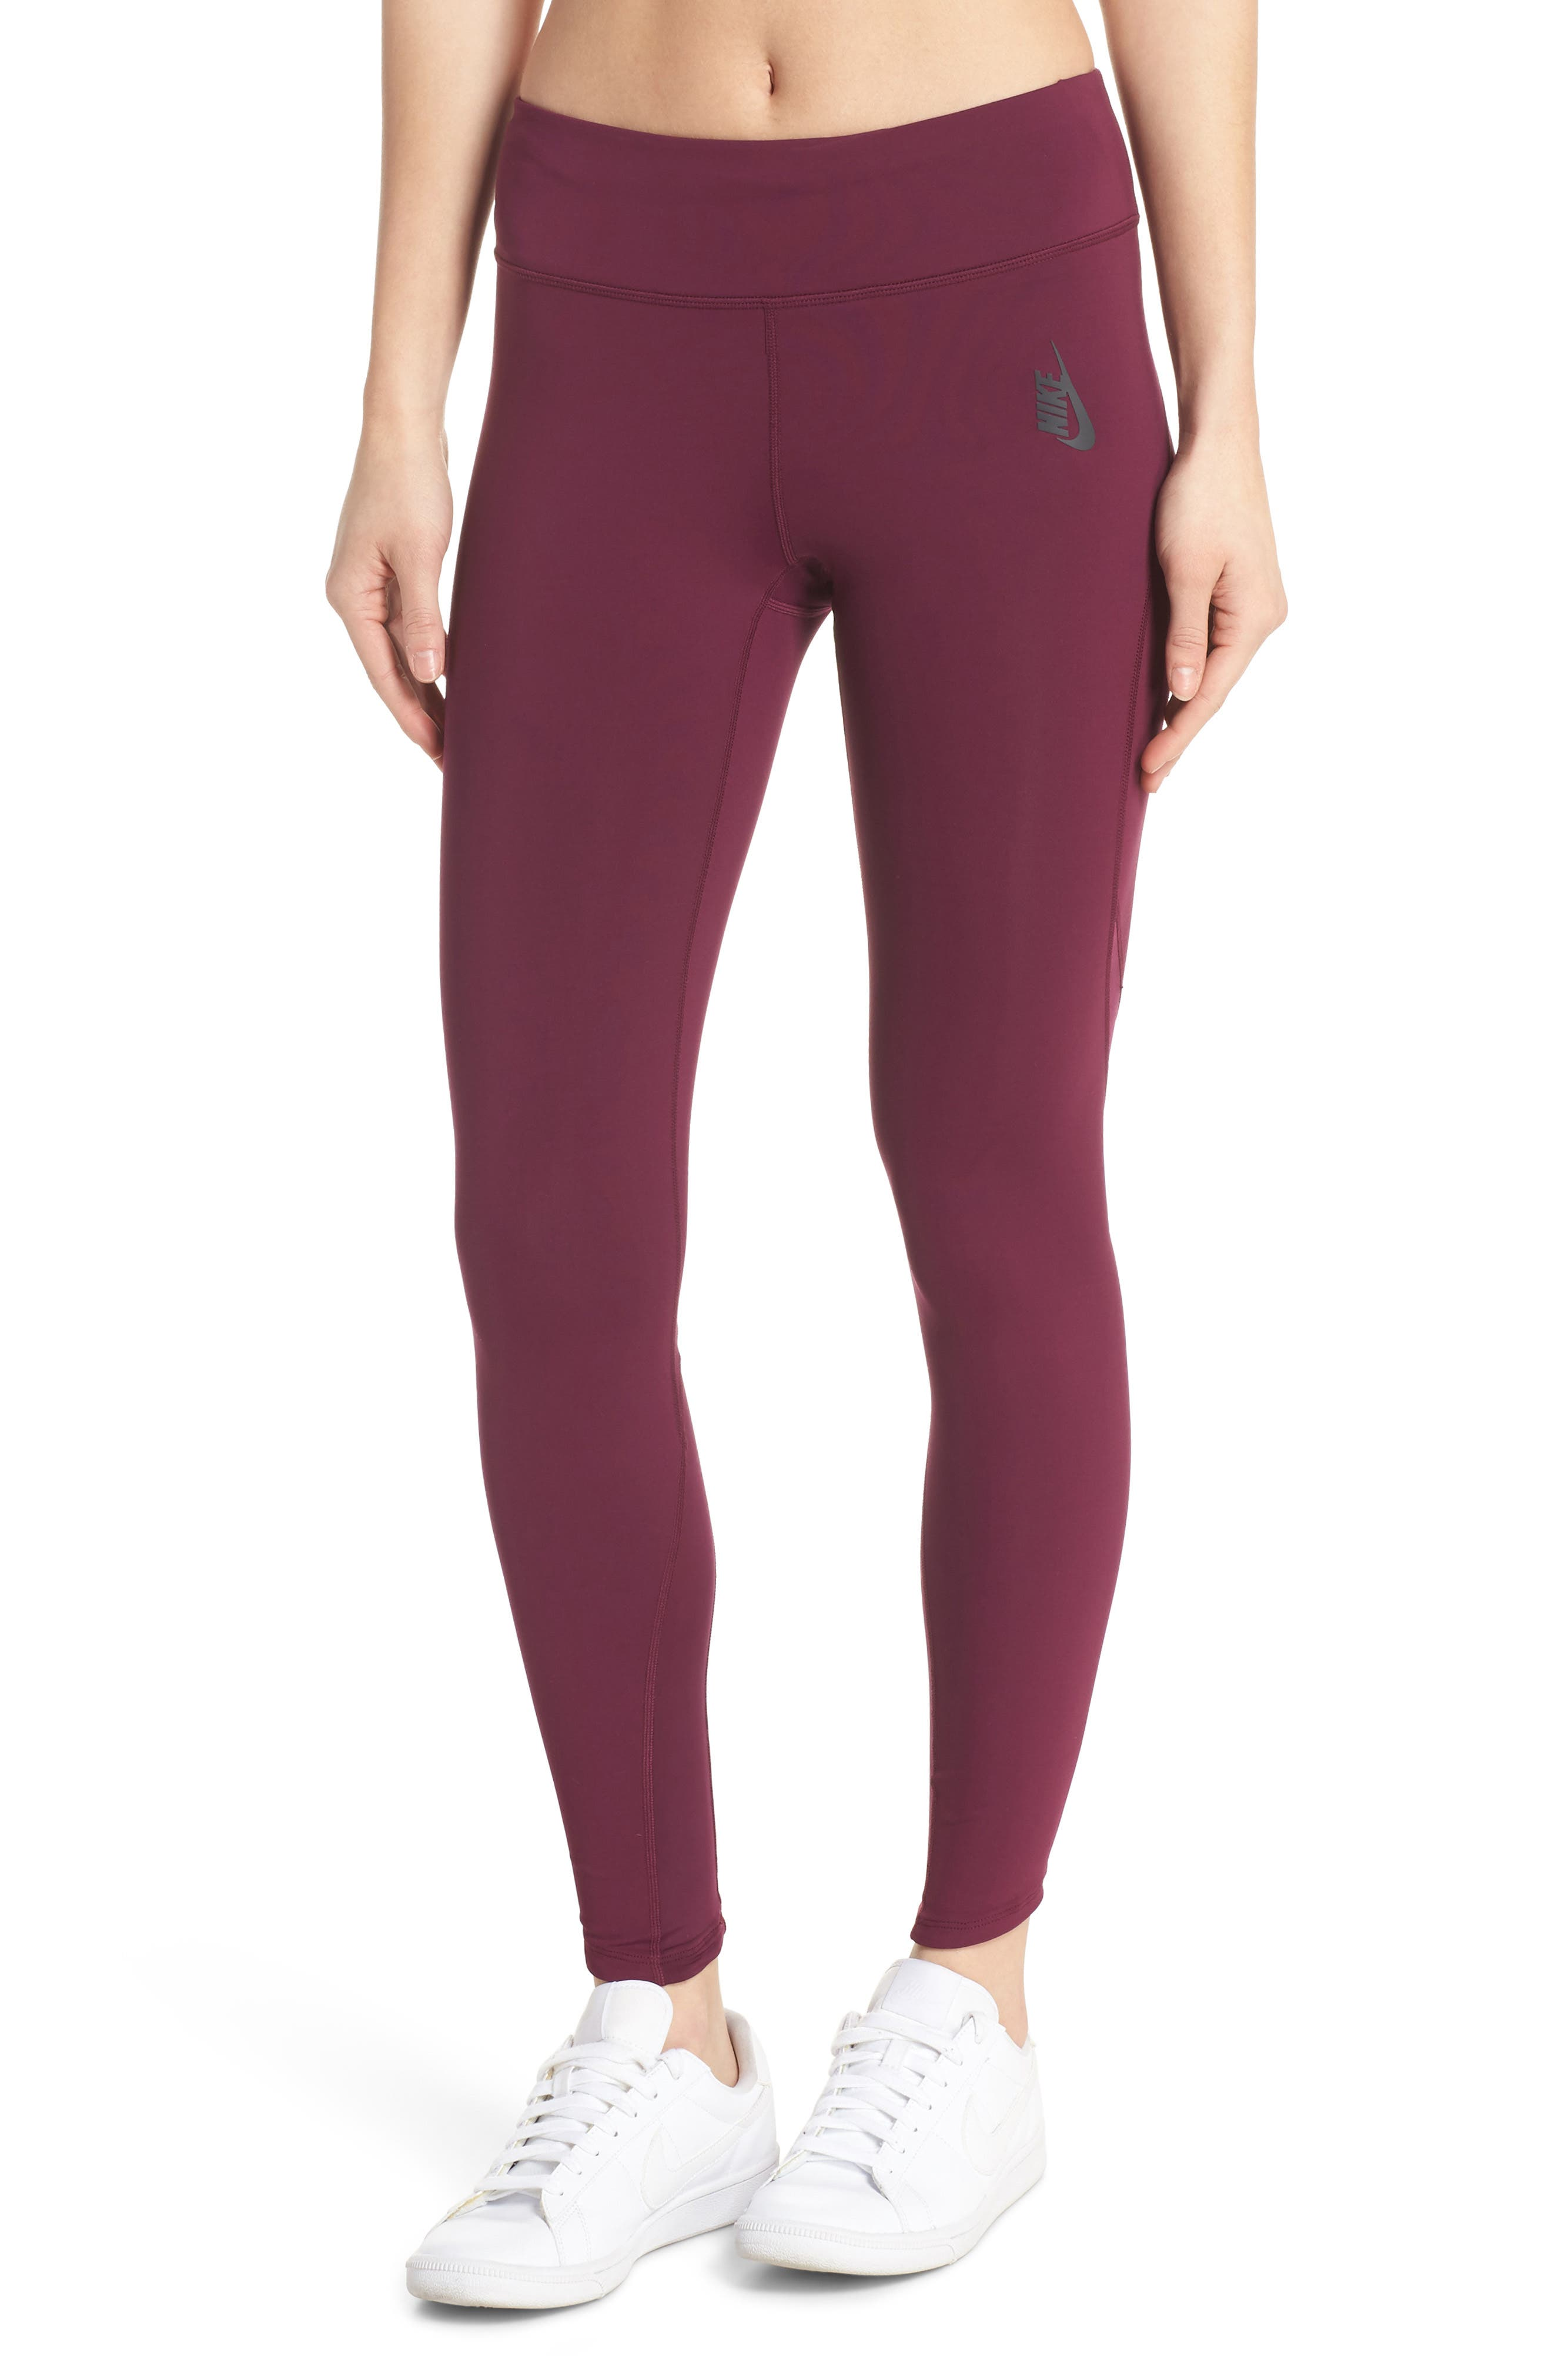 NikeLab Collection Dri-FIT Women's Tights,                         Main,                         color, BORDEAUX